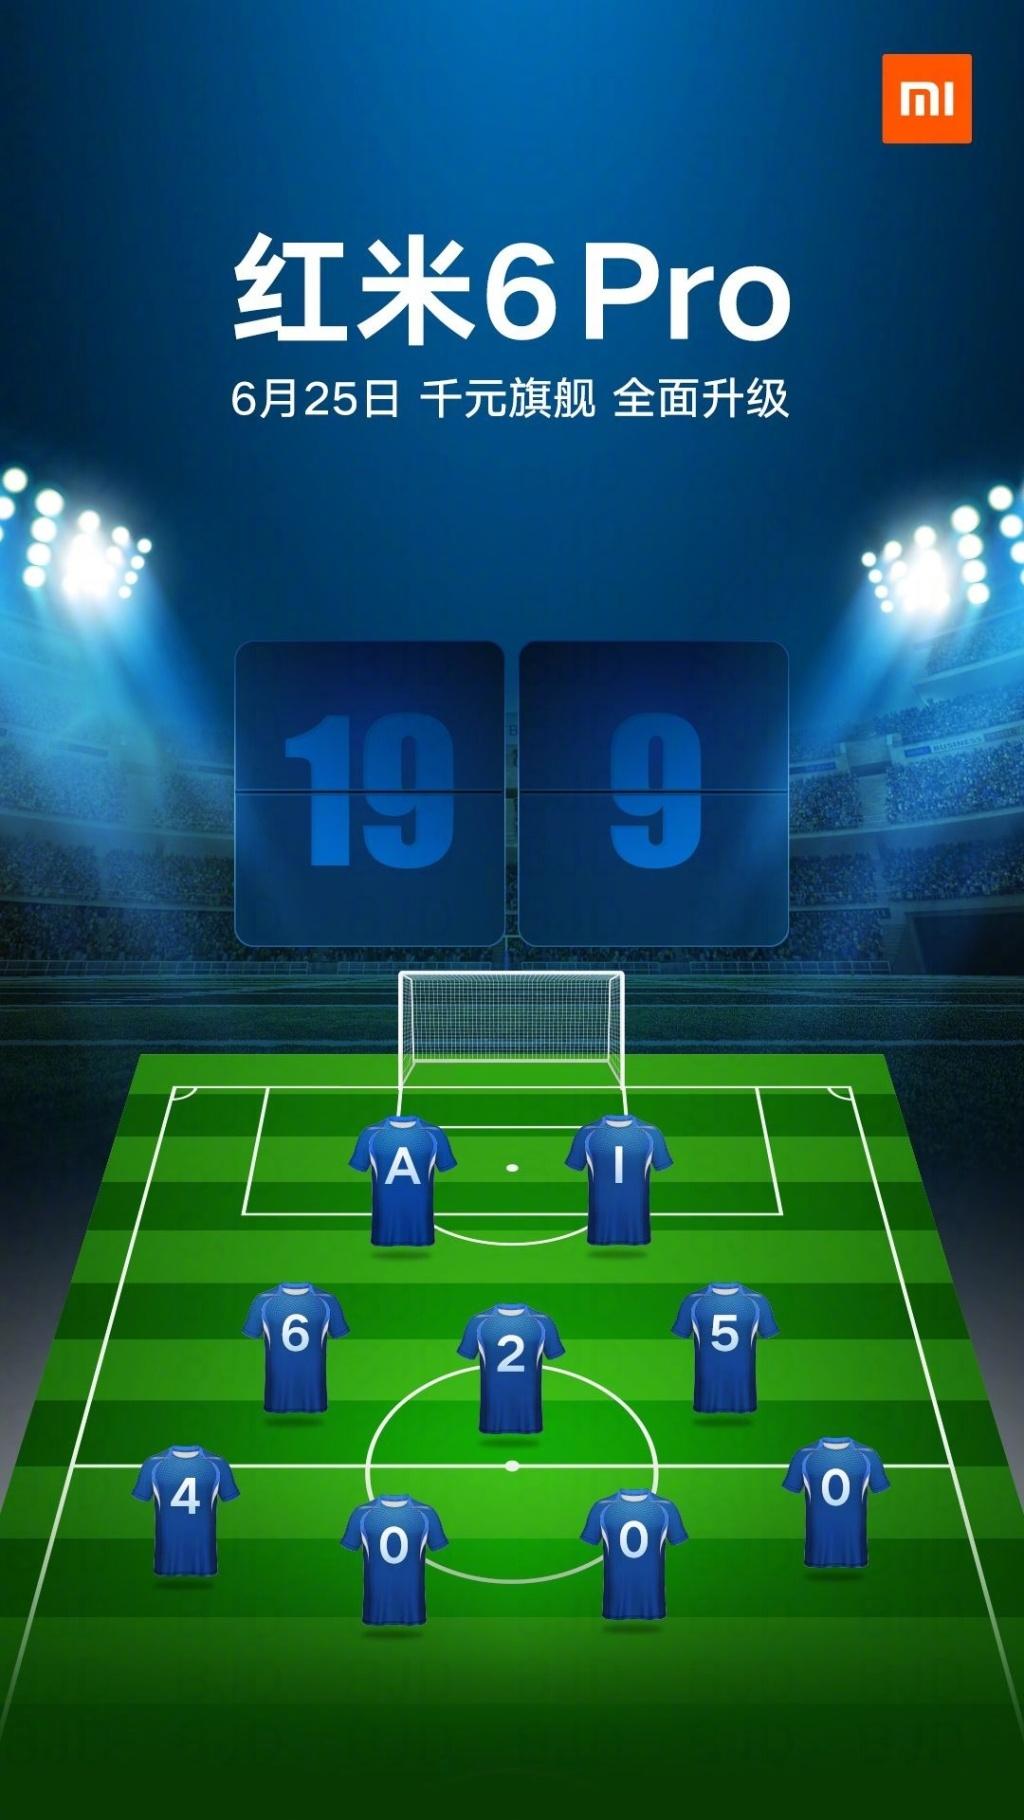 Xiaomi Event : RedMi 6 Pro & Mi Pad 4 2